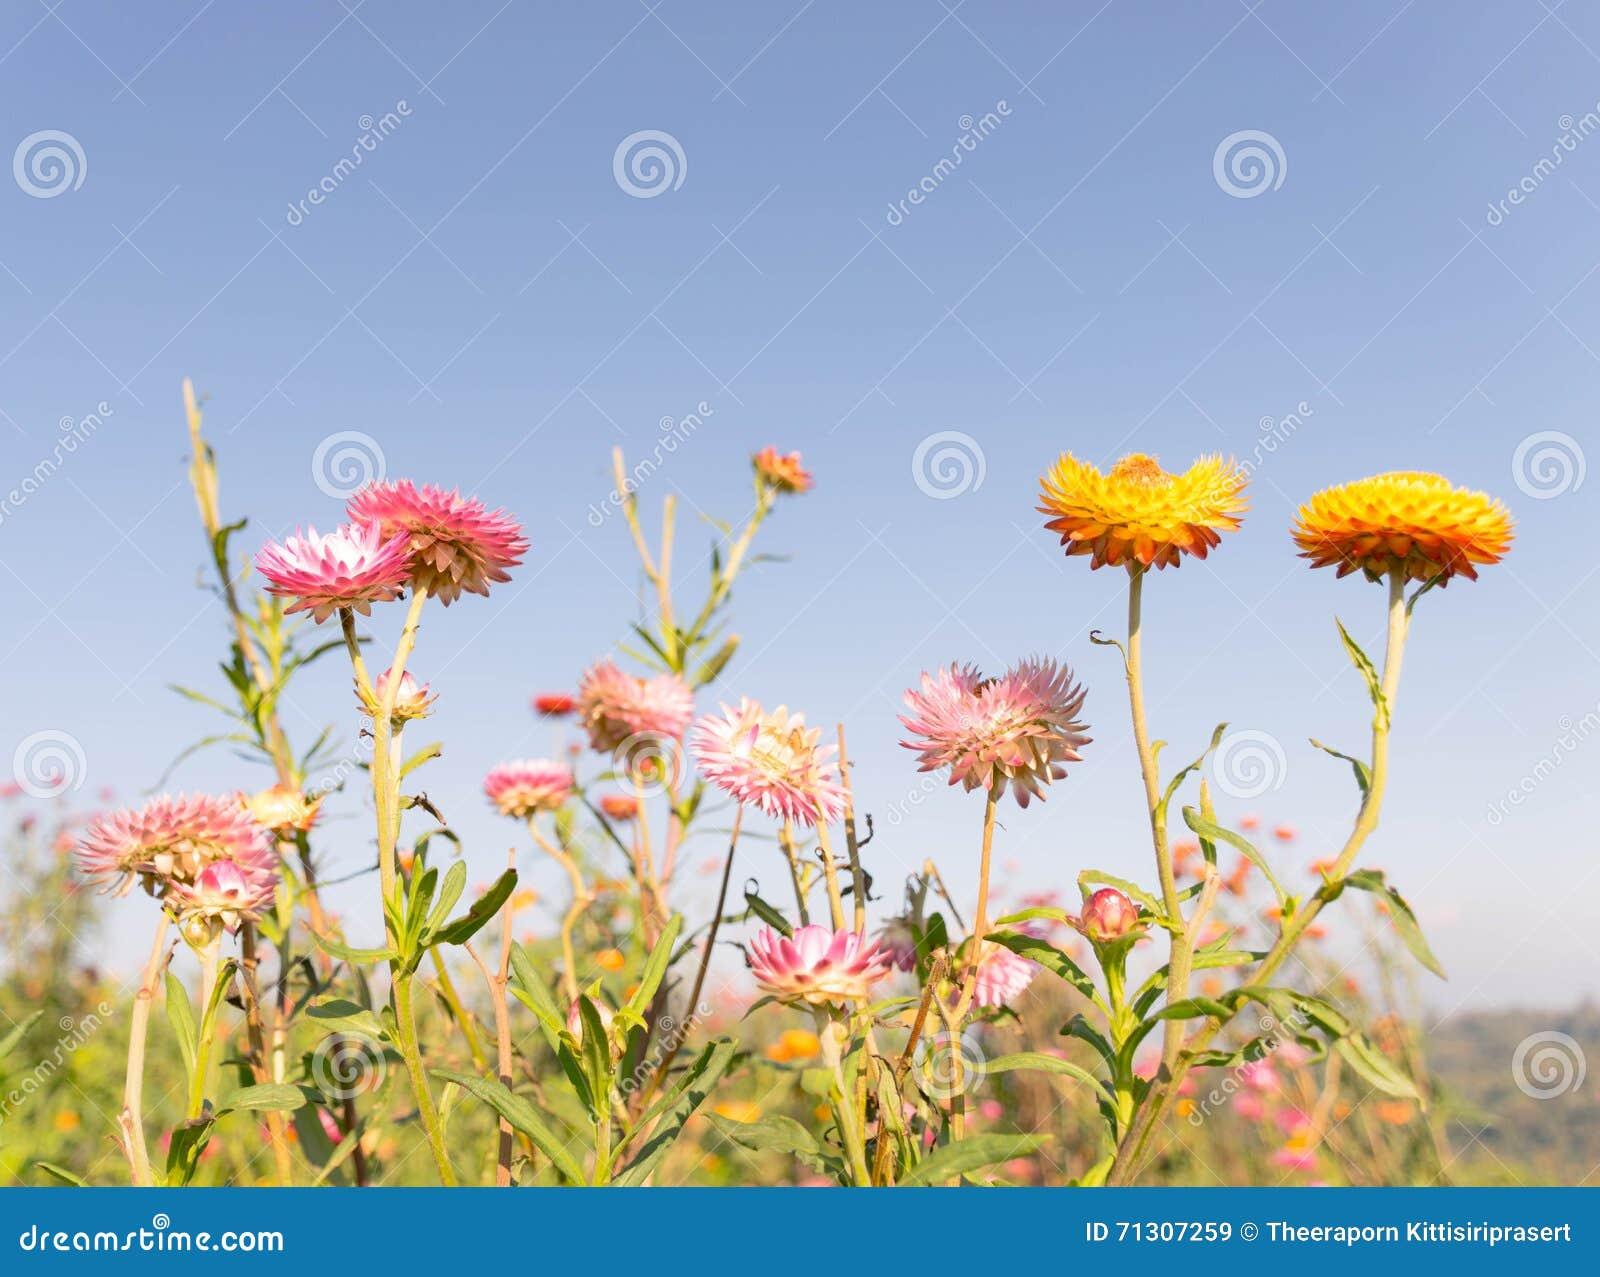 Everlasting Flower Field Stock Image Image Of Pink Cute 71307259